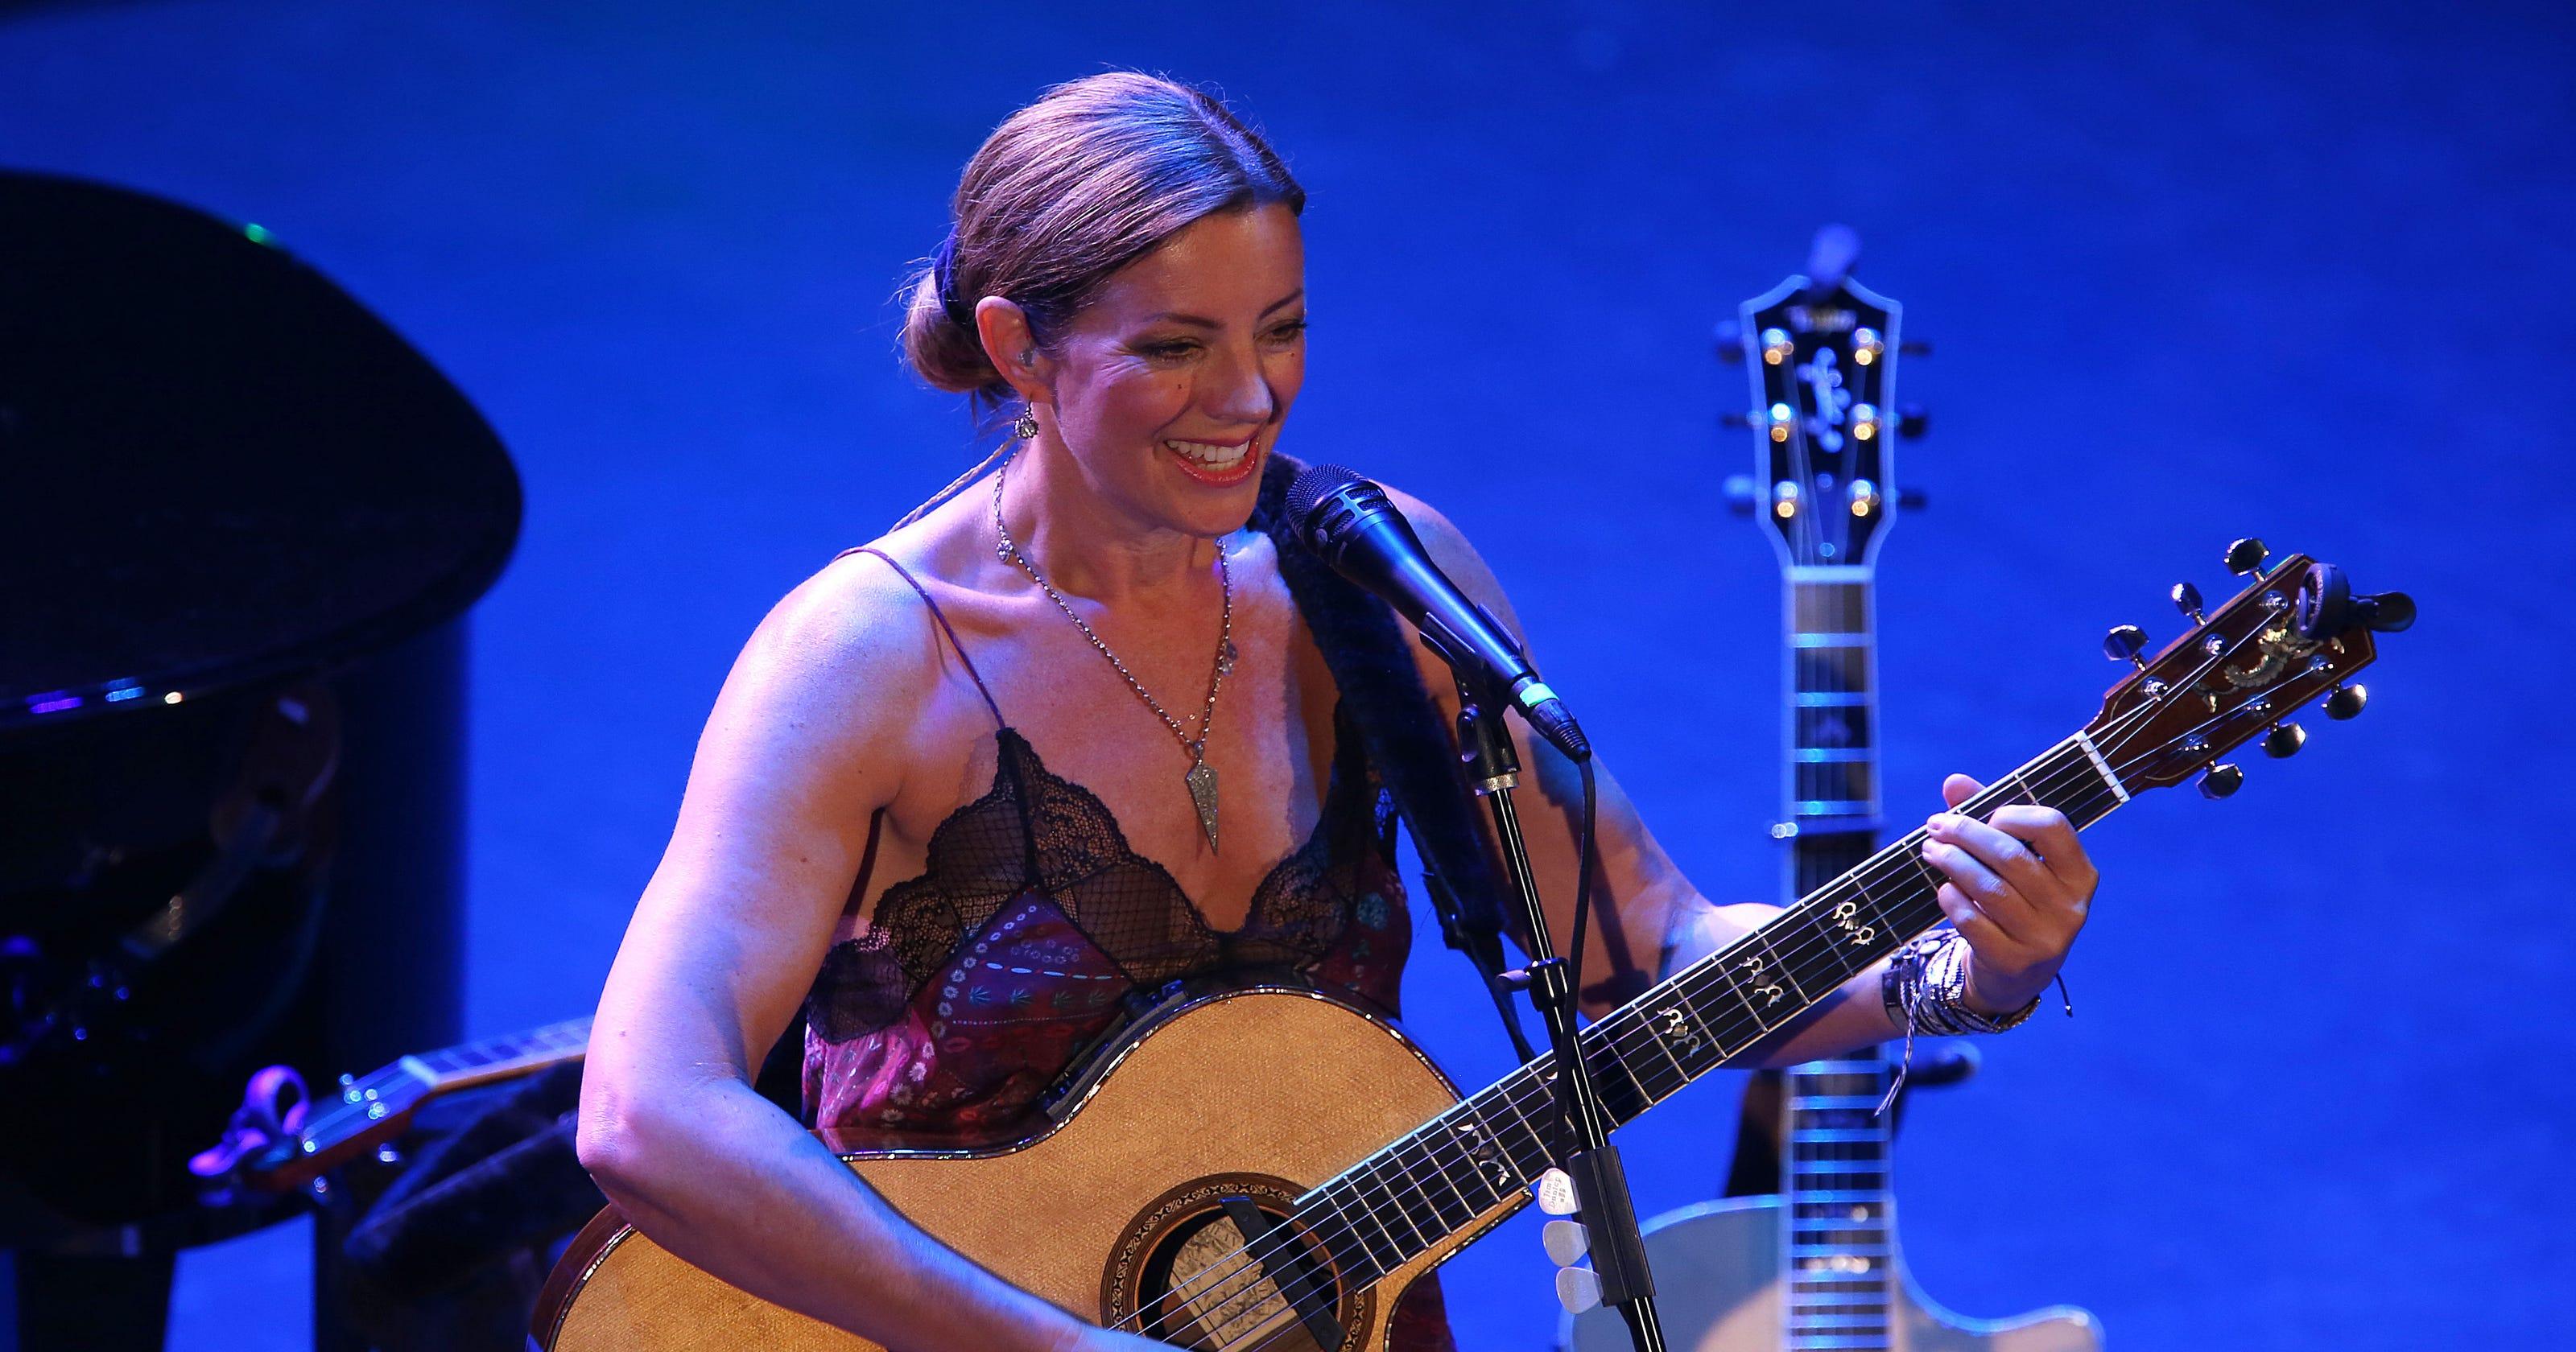 sarah mclachlan concert photos from asbury park mary s place benefit